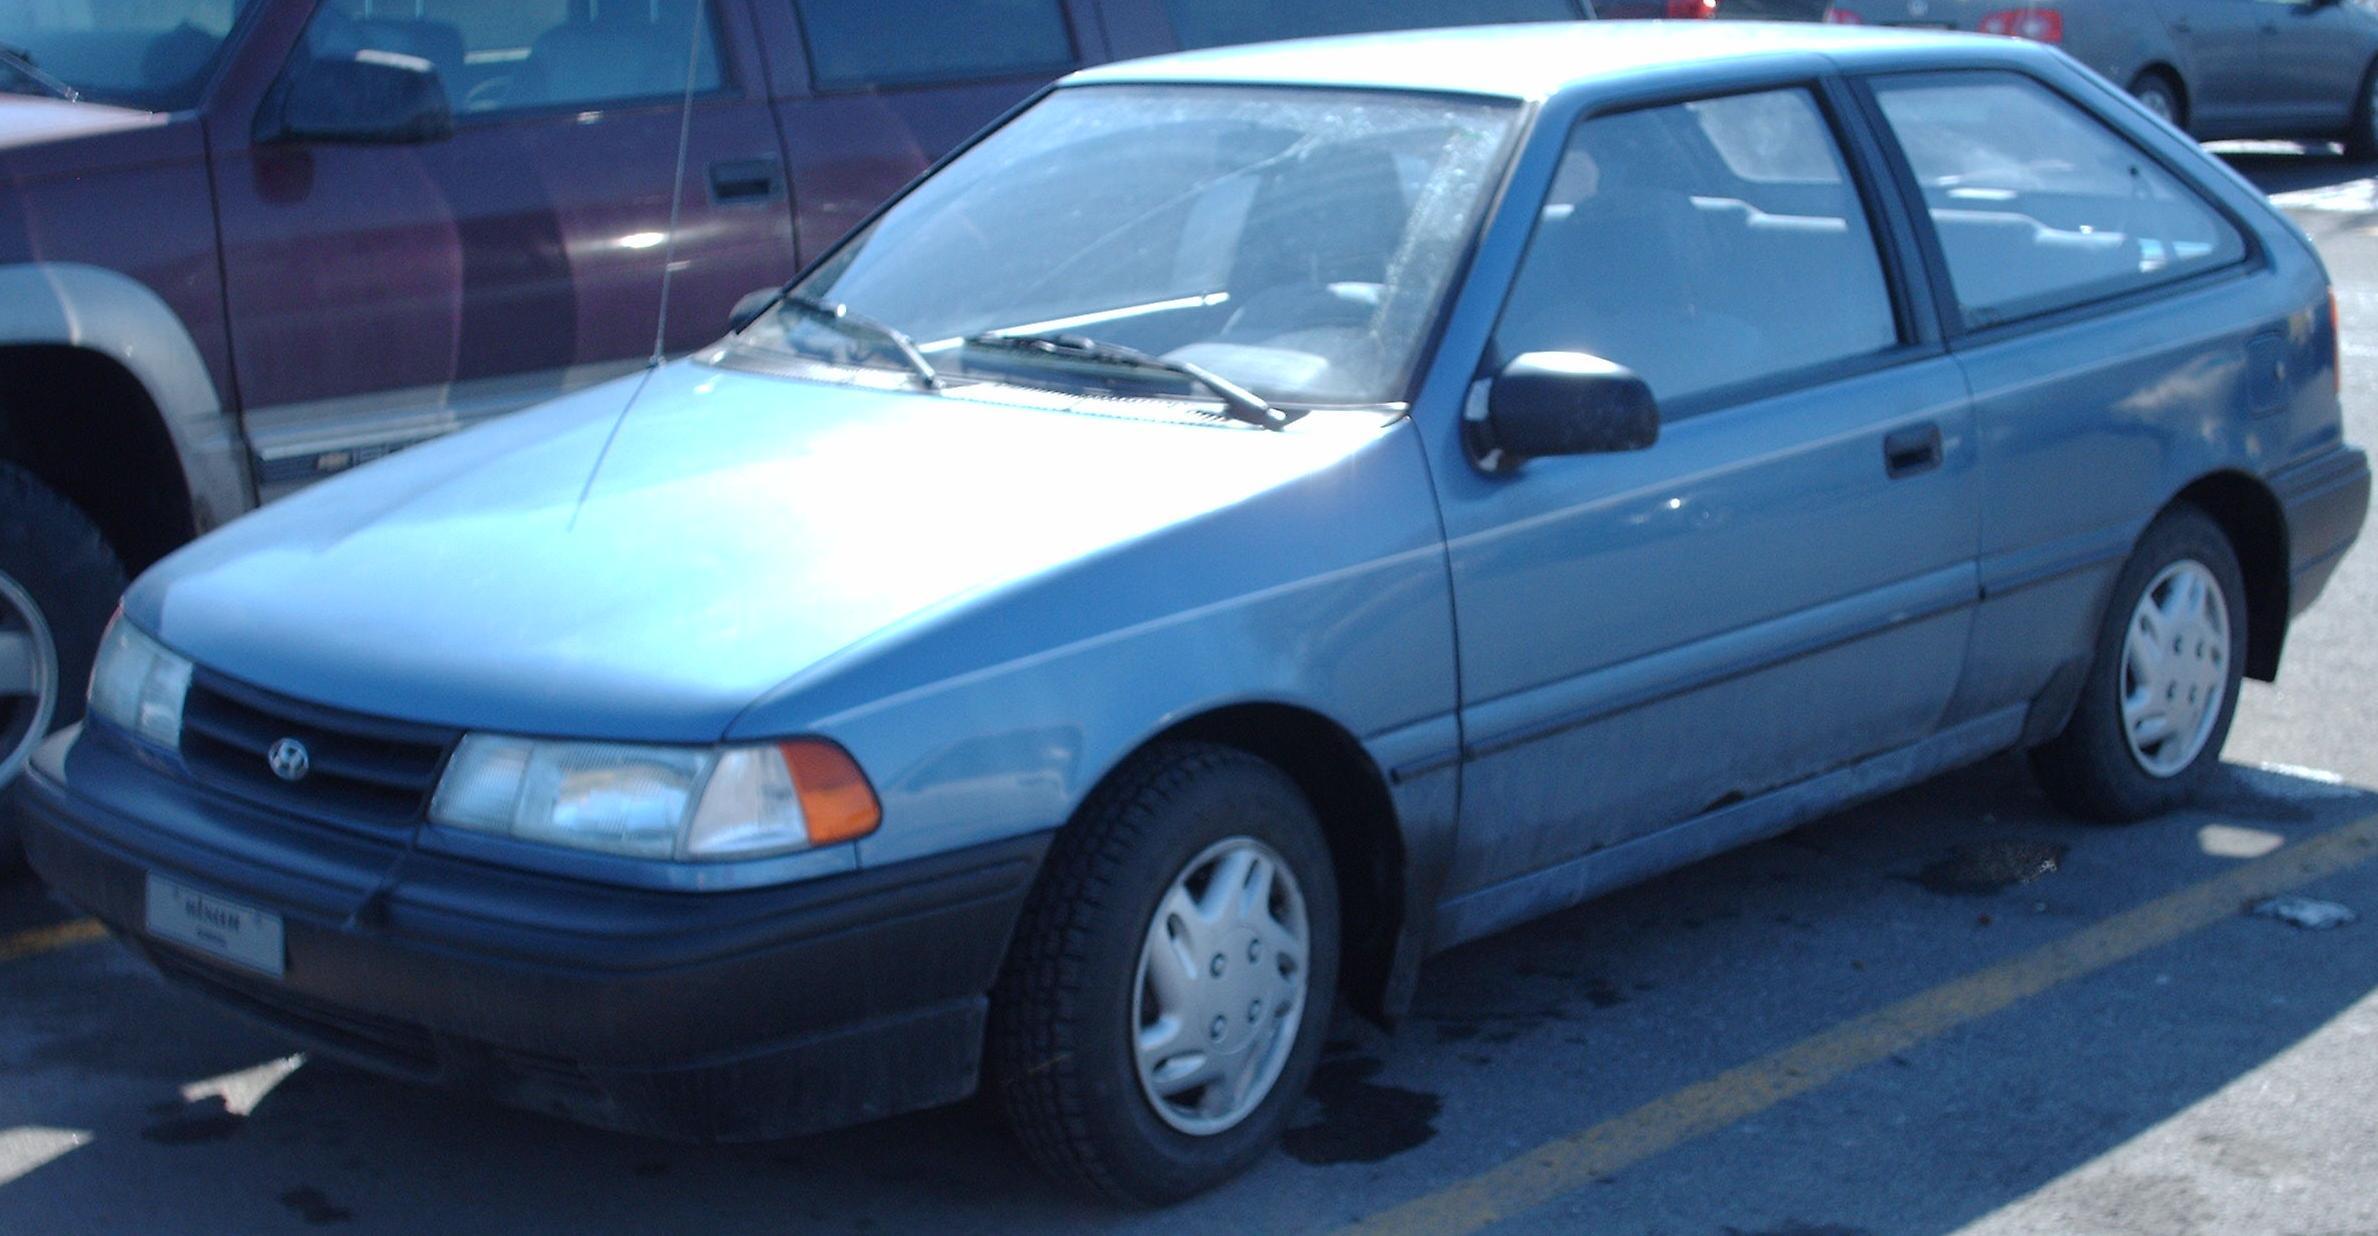 File Hyundai Excel Hatchback 92 94 Jpg Wikimedia Commons